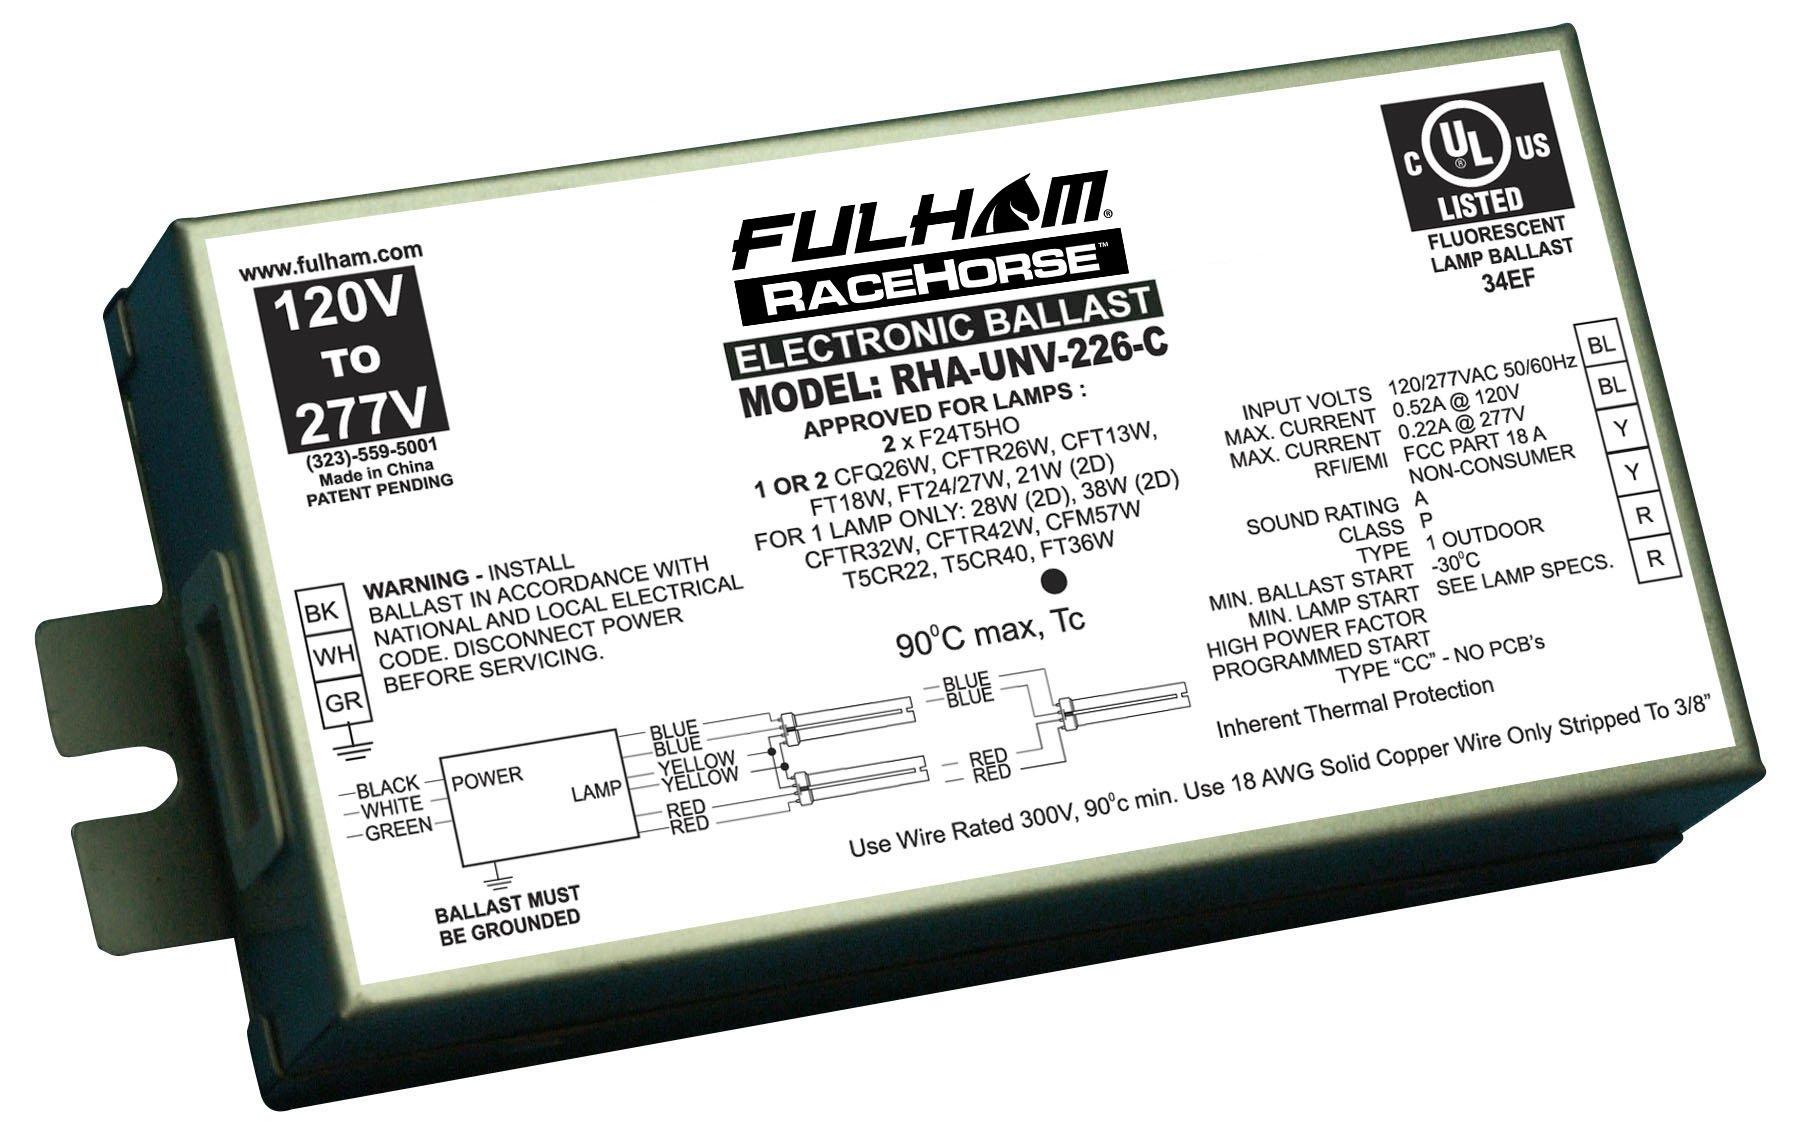 Fulham RHA-UNV-226-C RaceHorse CFL Ballast